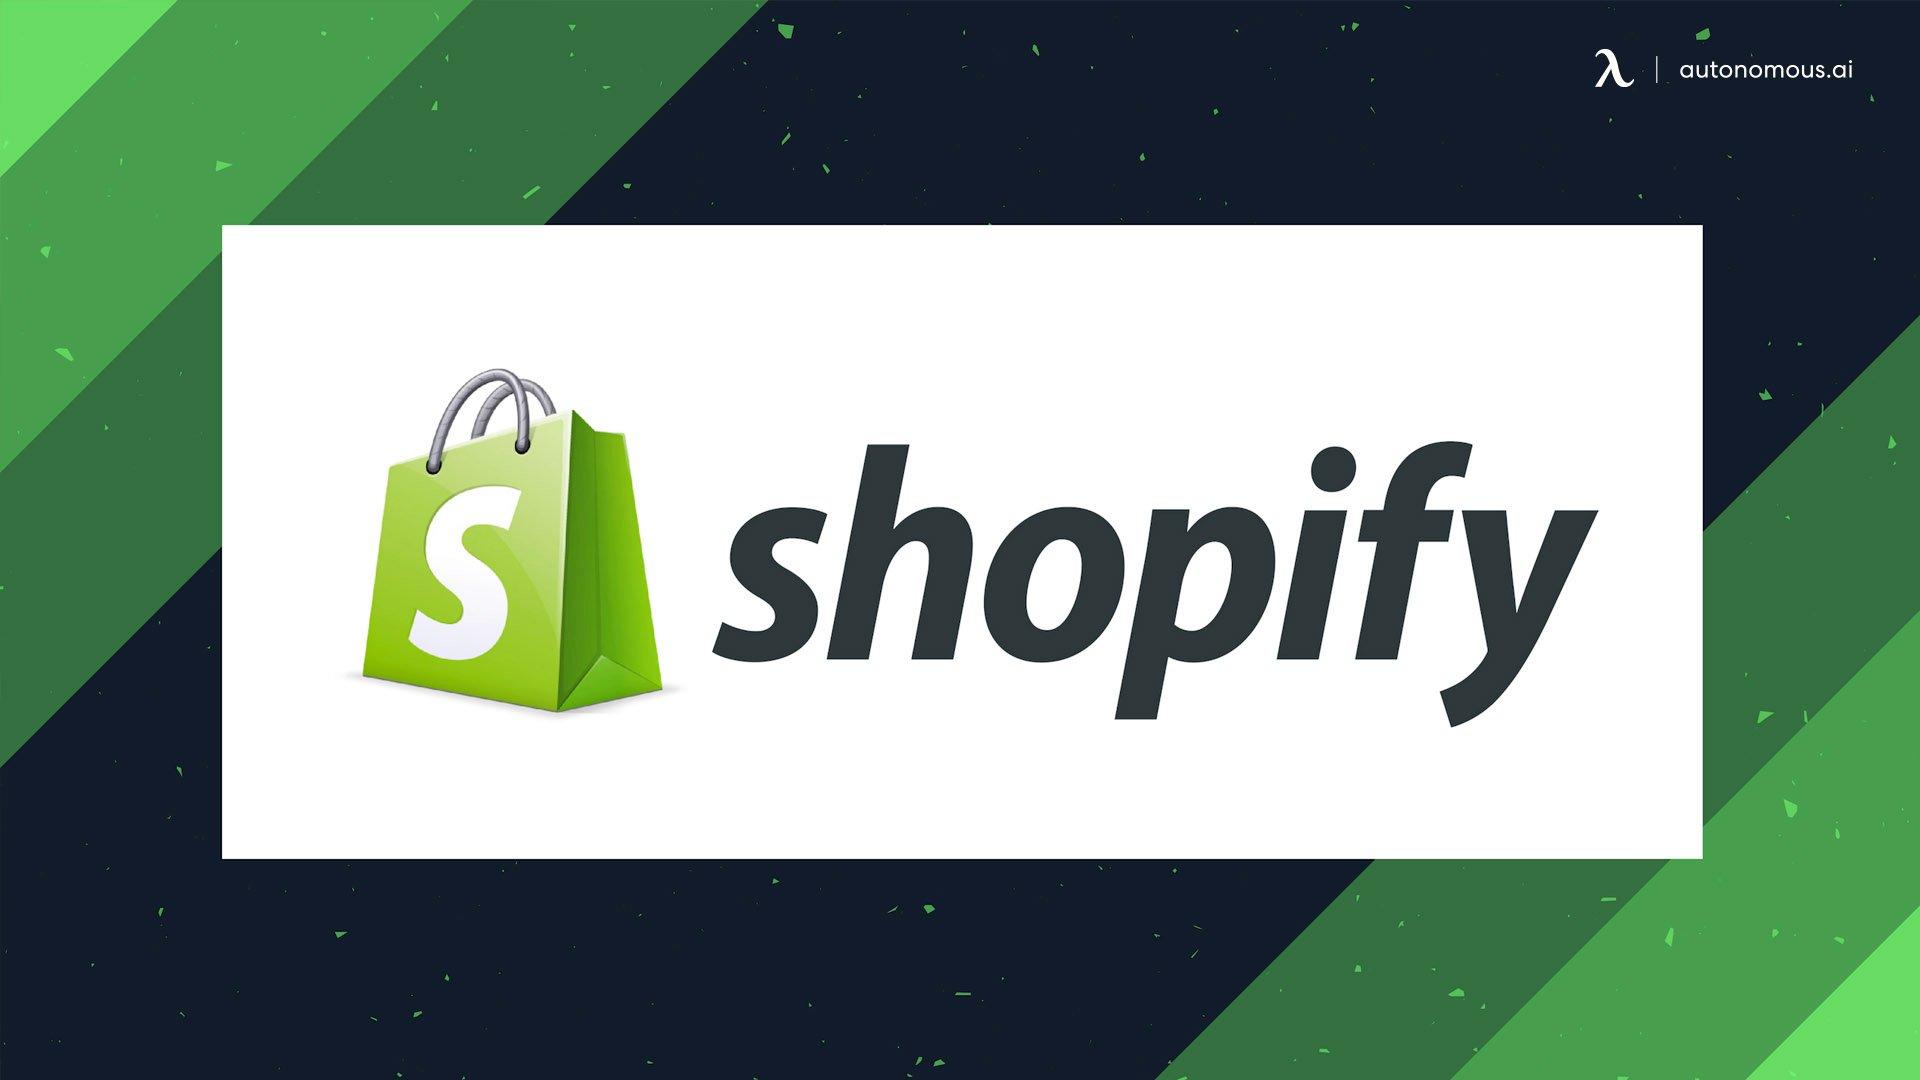 Sell item using online platforms